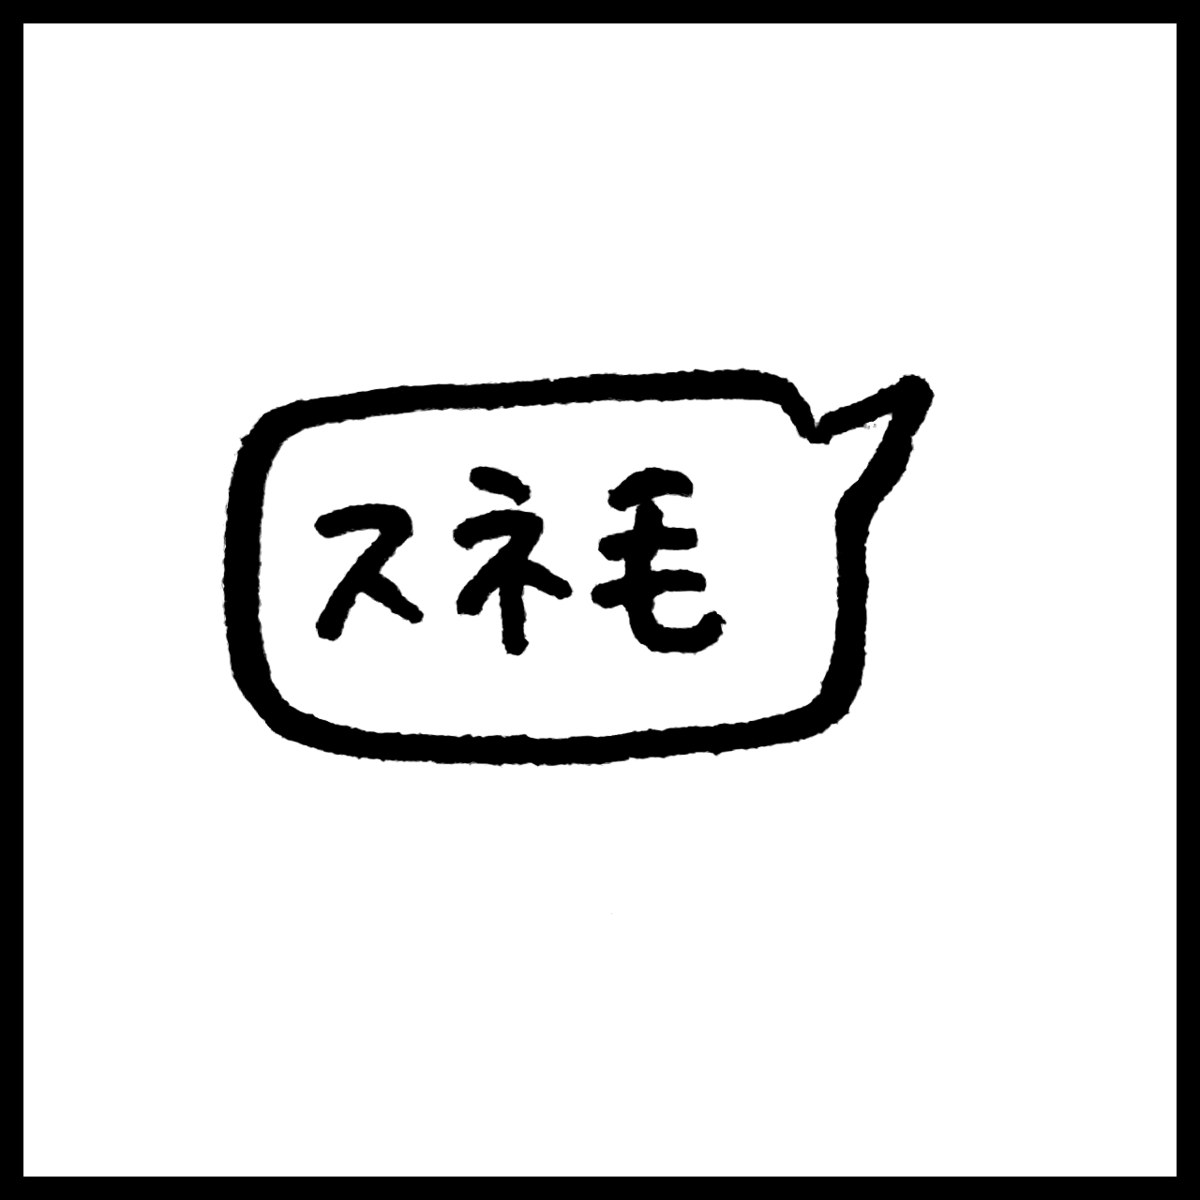 f:id:komyusyomama:20210812185108p:plain